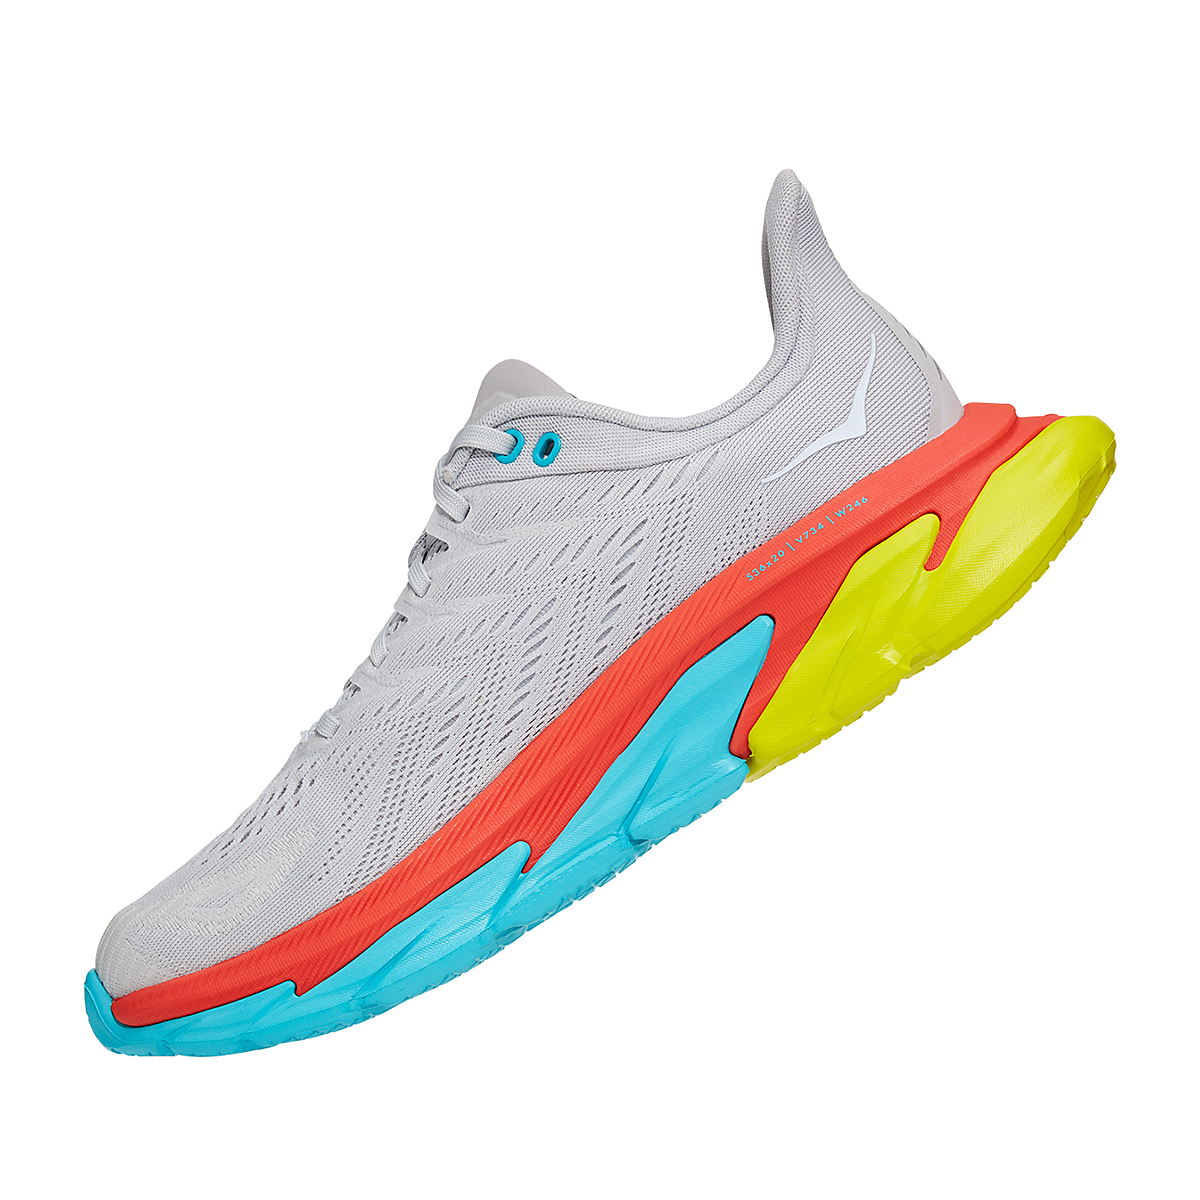 Men's Hoka One One Clifton Edge Running Shoe - Color: Lunar Rock/White - Size: 8.5 - Width: Regular, Lunar Rock/White, large, image 2